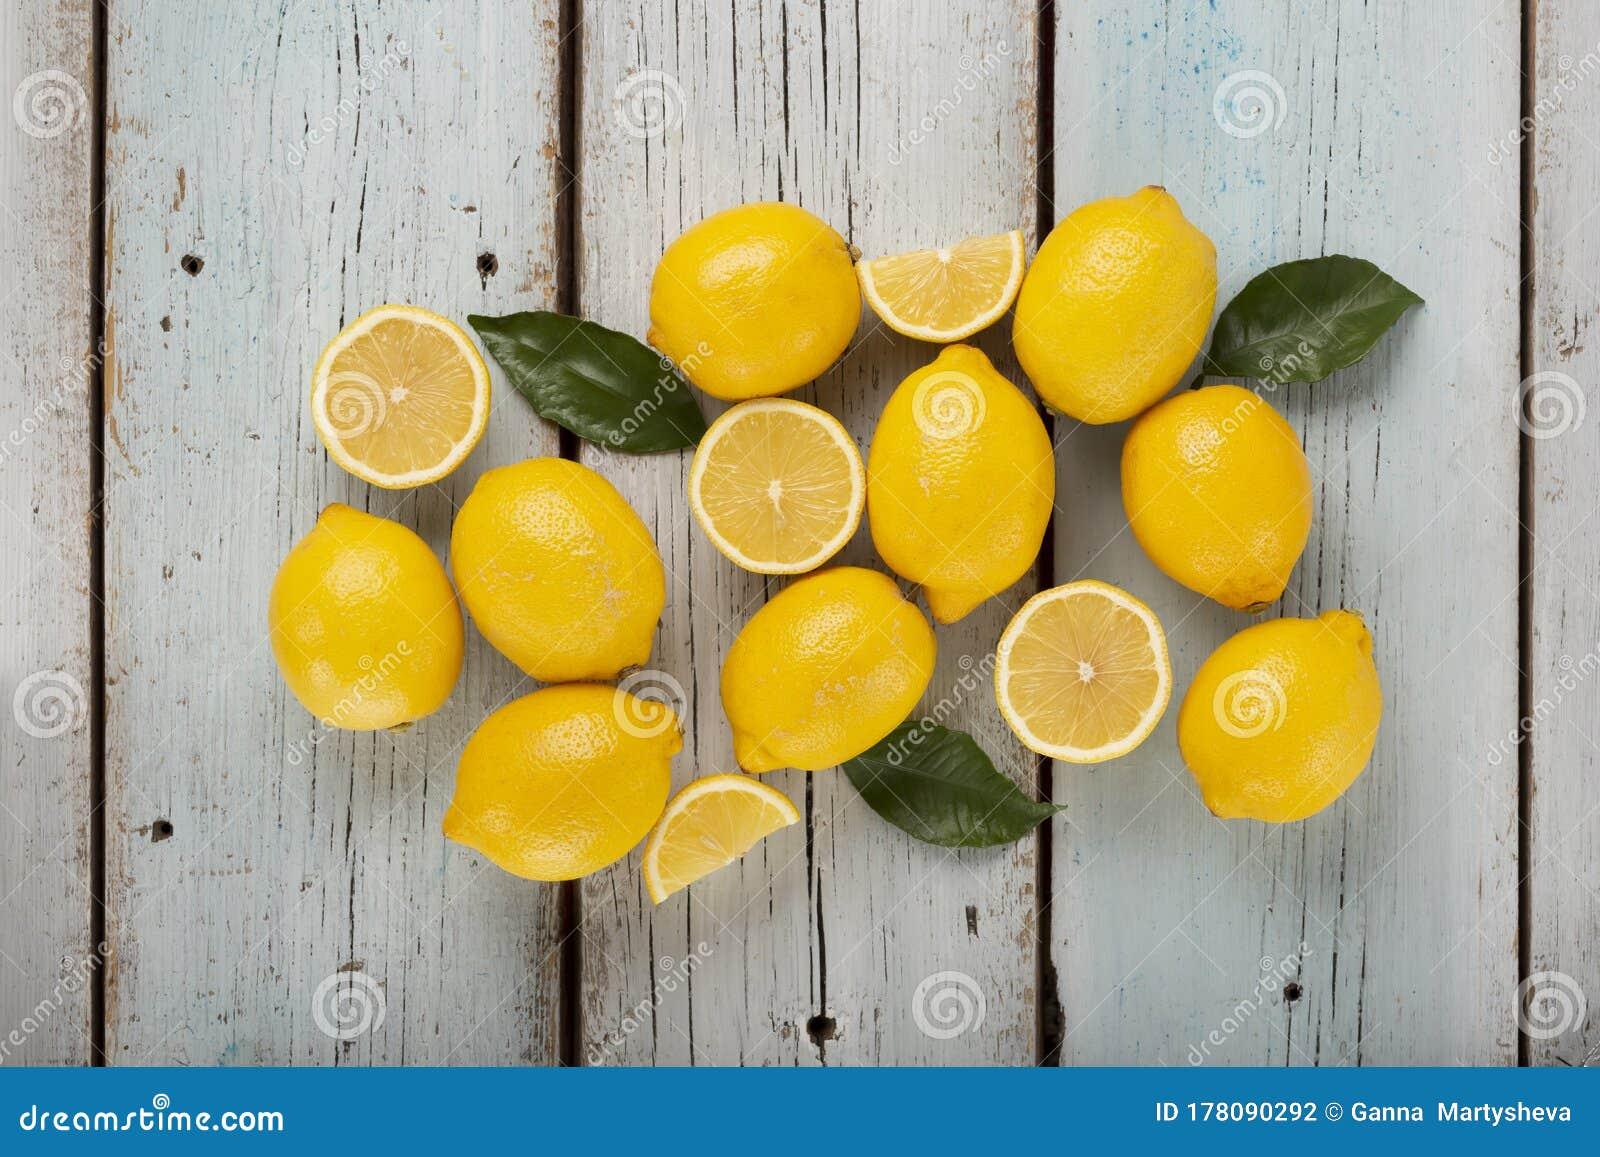 Lemons Wallpaper Clipart Watercolor Aesthetic Yellow Blue Lemon Stock Photo Image Of Green Flat 178090292